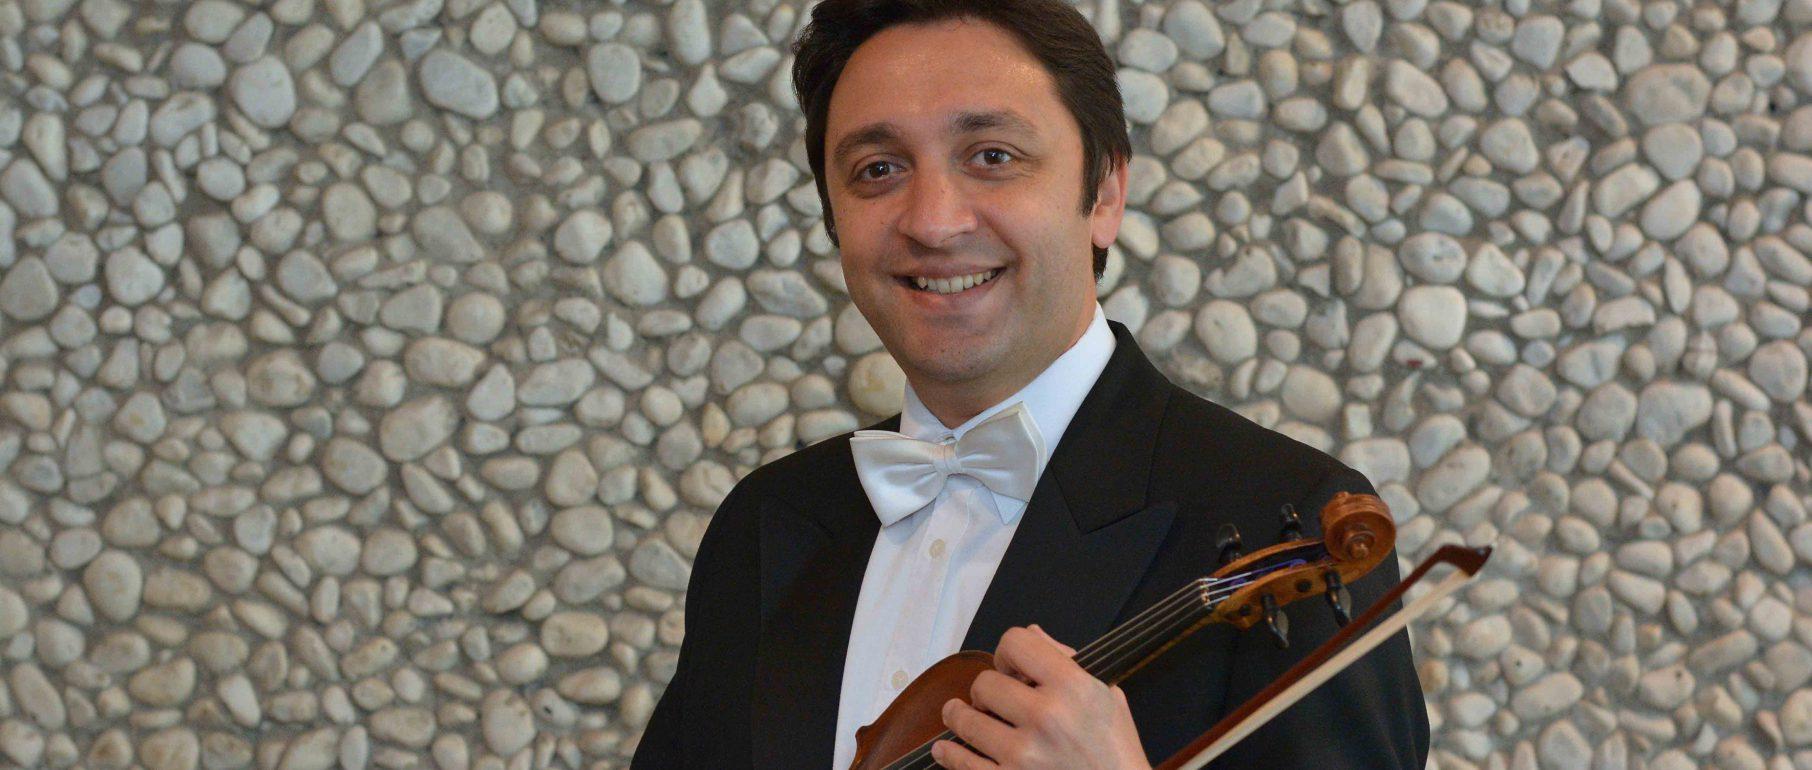 Claudiu Rupa, 2. Violine